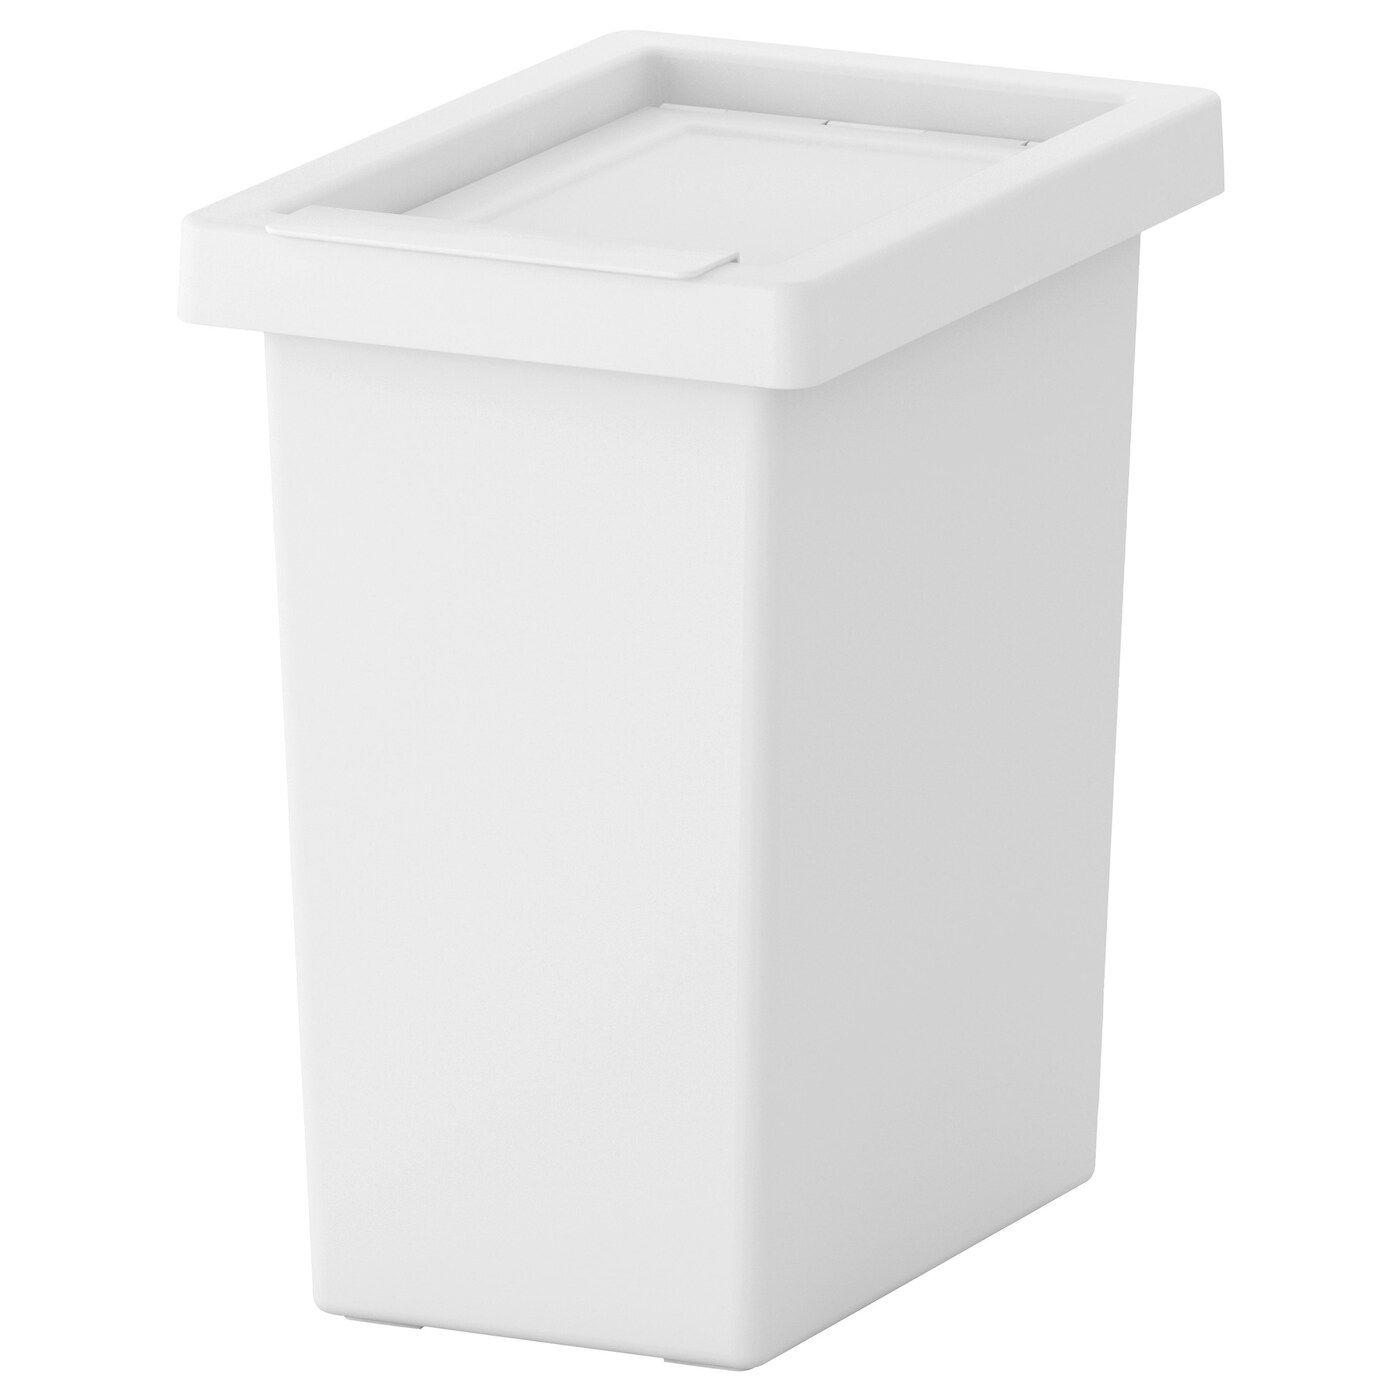 Filur Cubo Con Tapa Blanco Ikea Mesitas De Noche Ikea Cubo De Basura